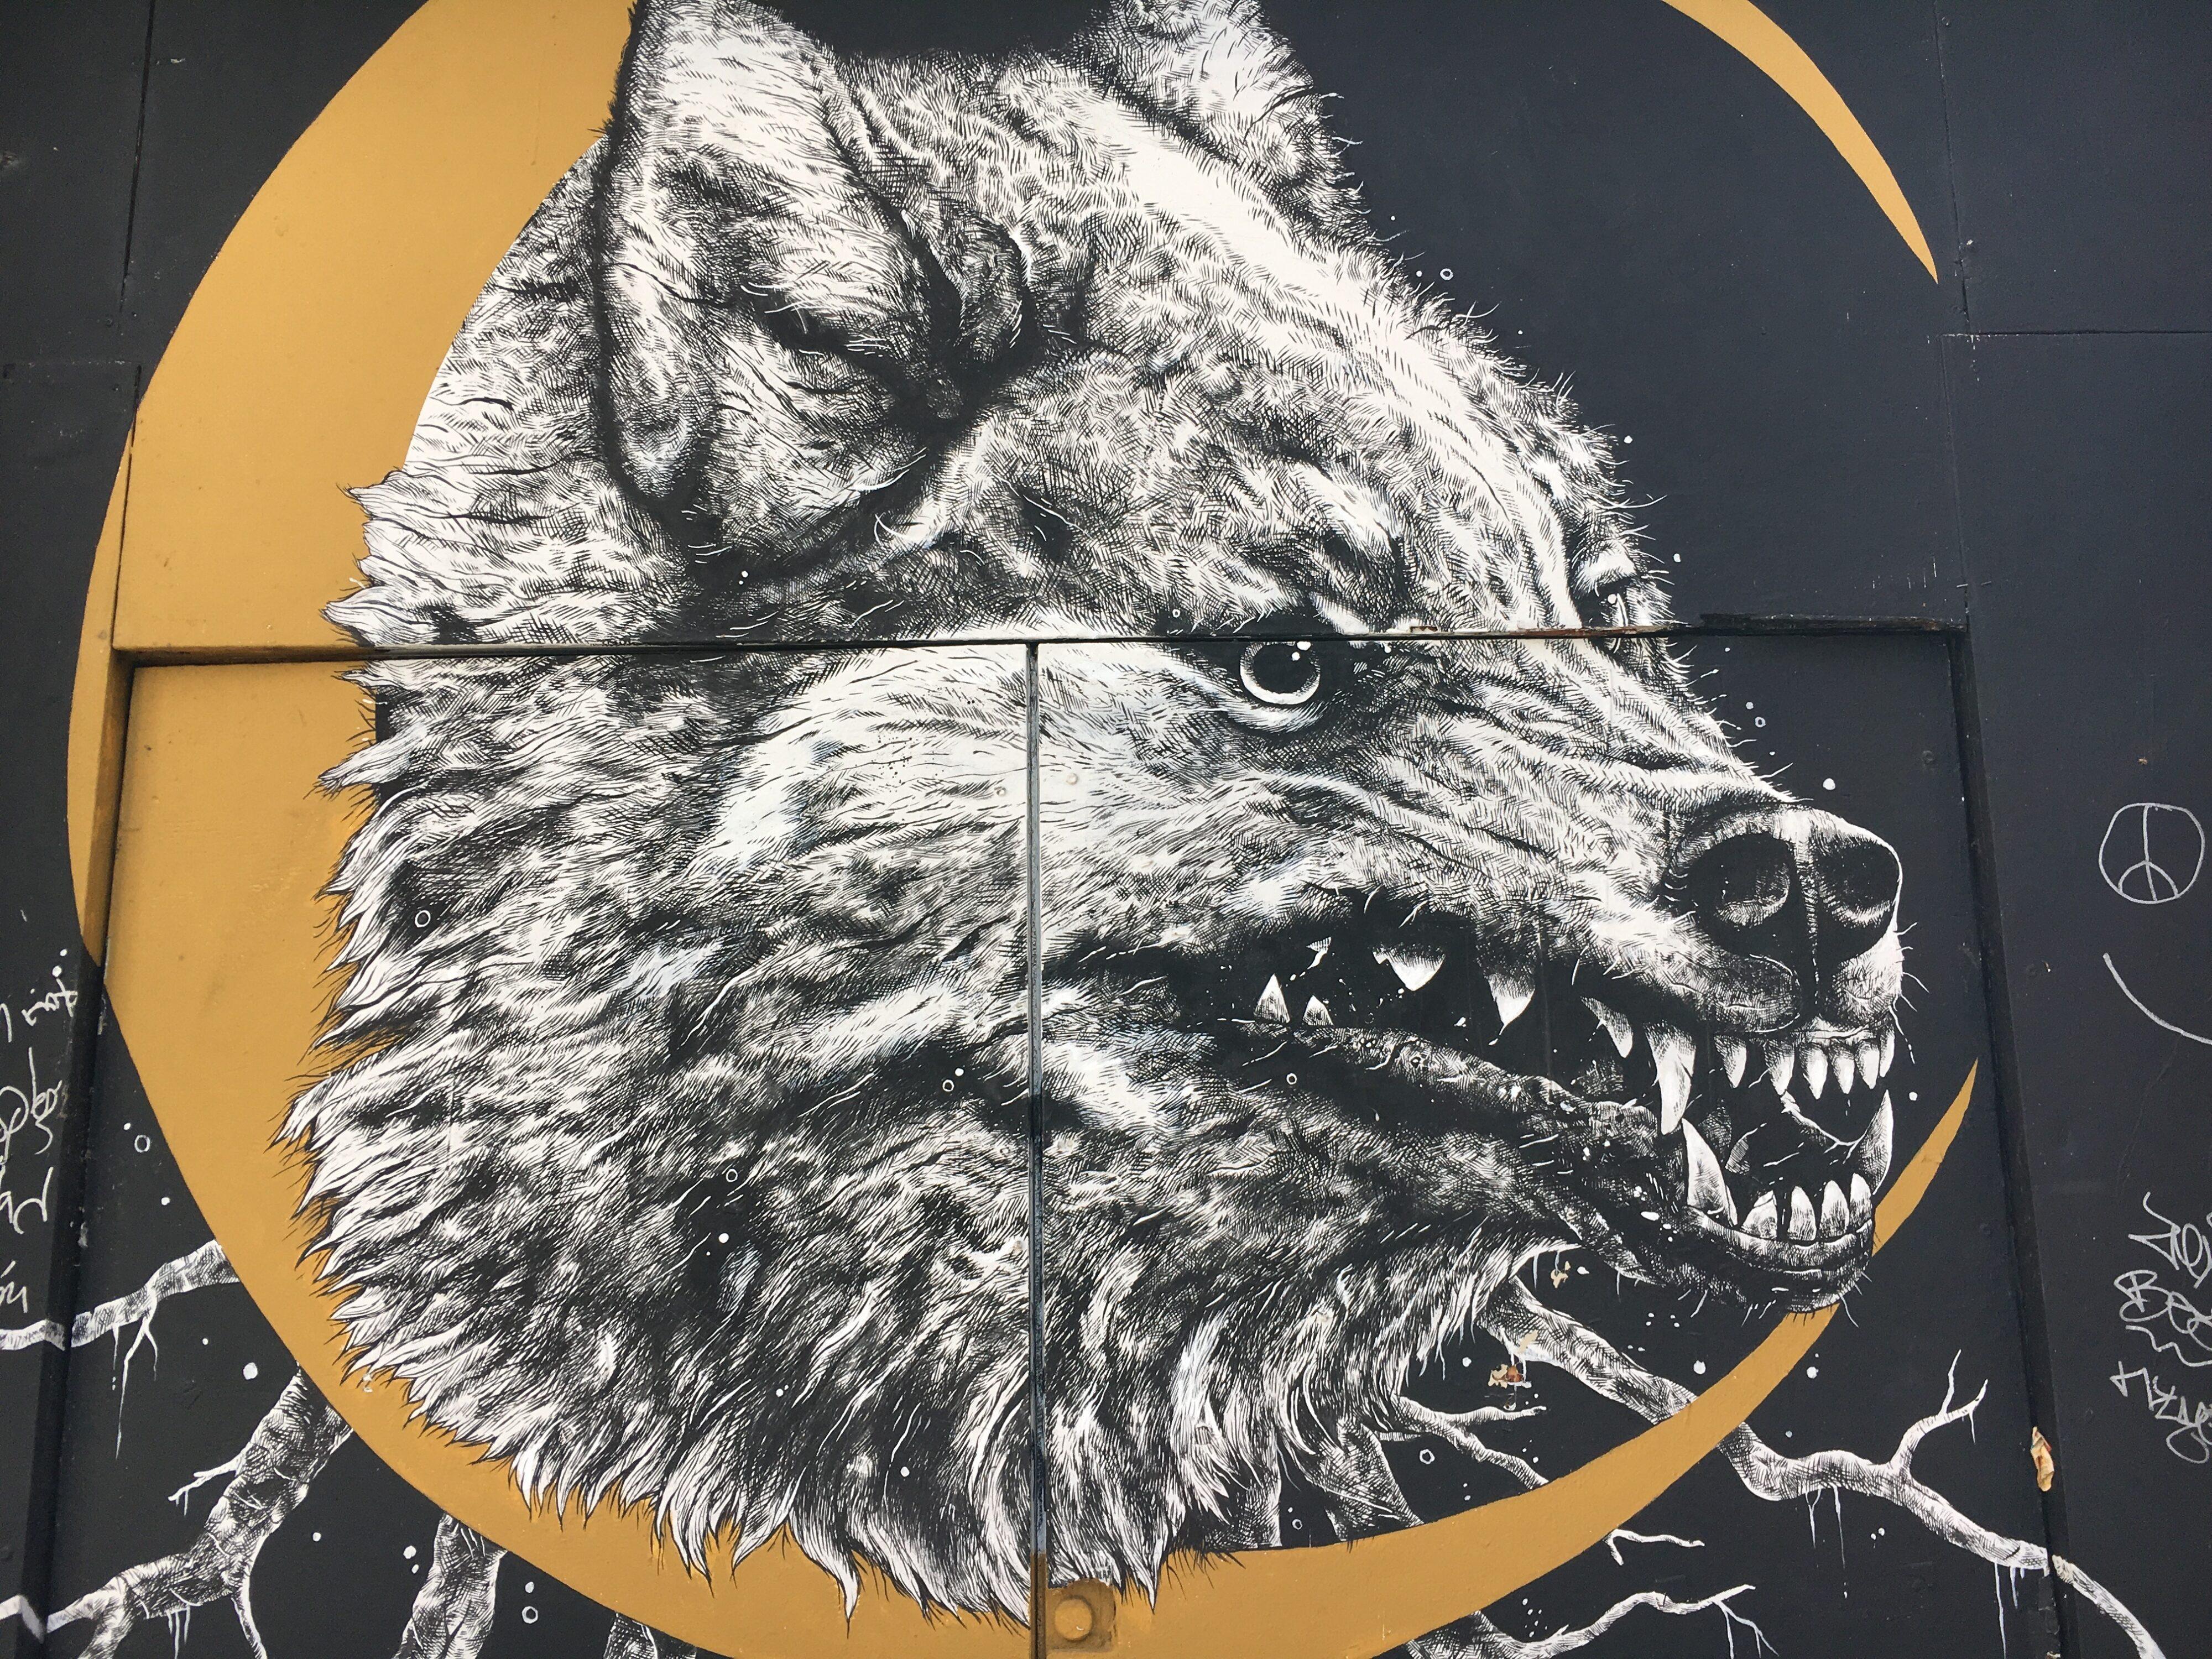 san juan puerto rico street art